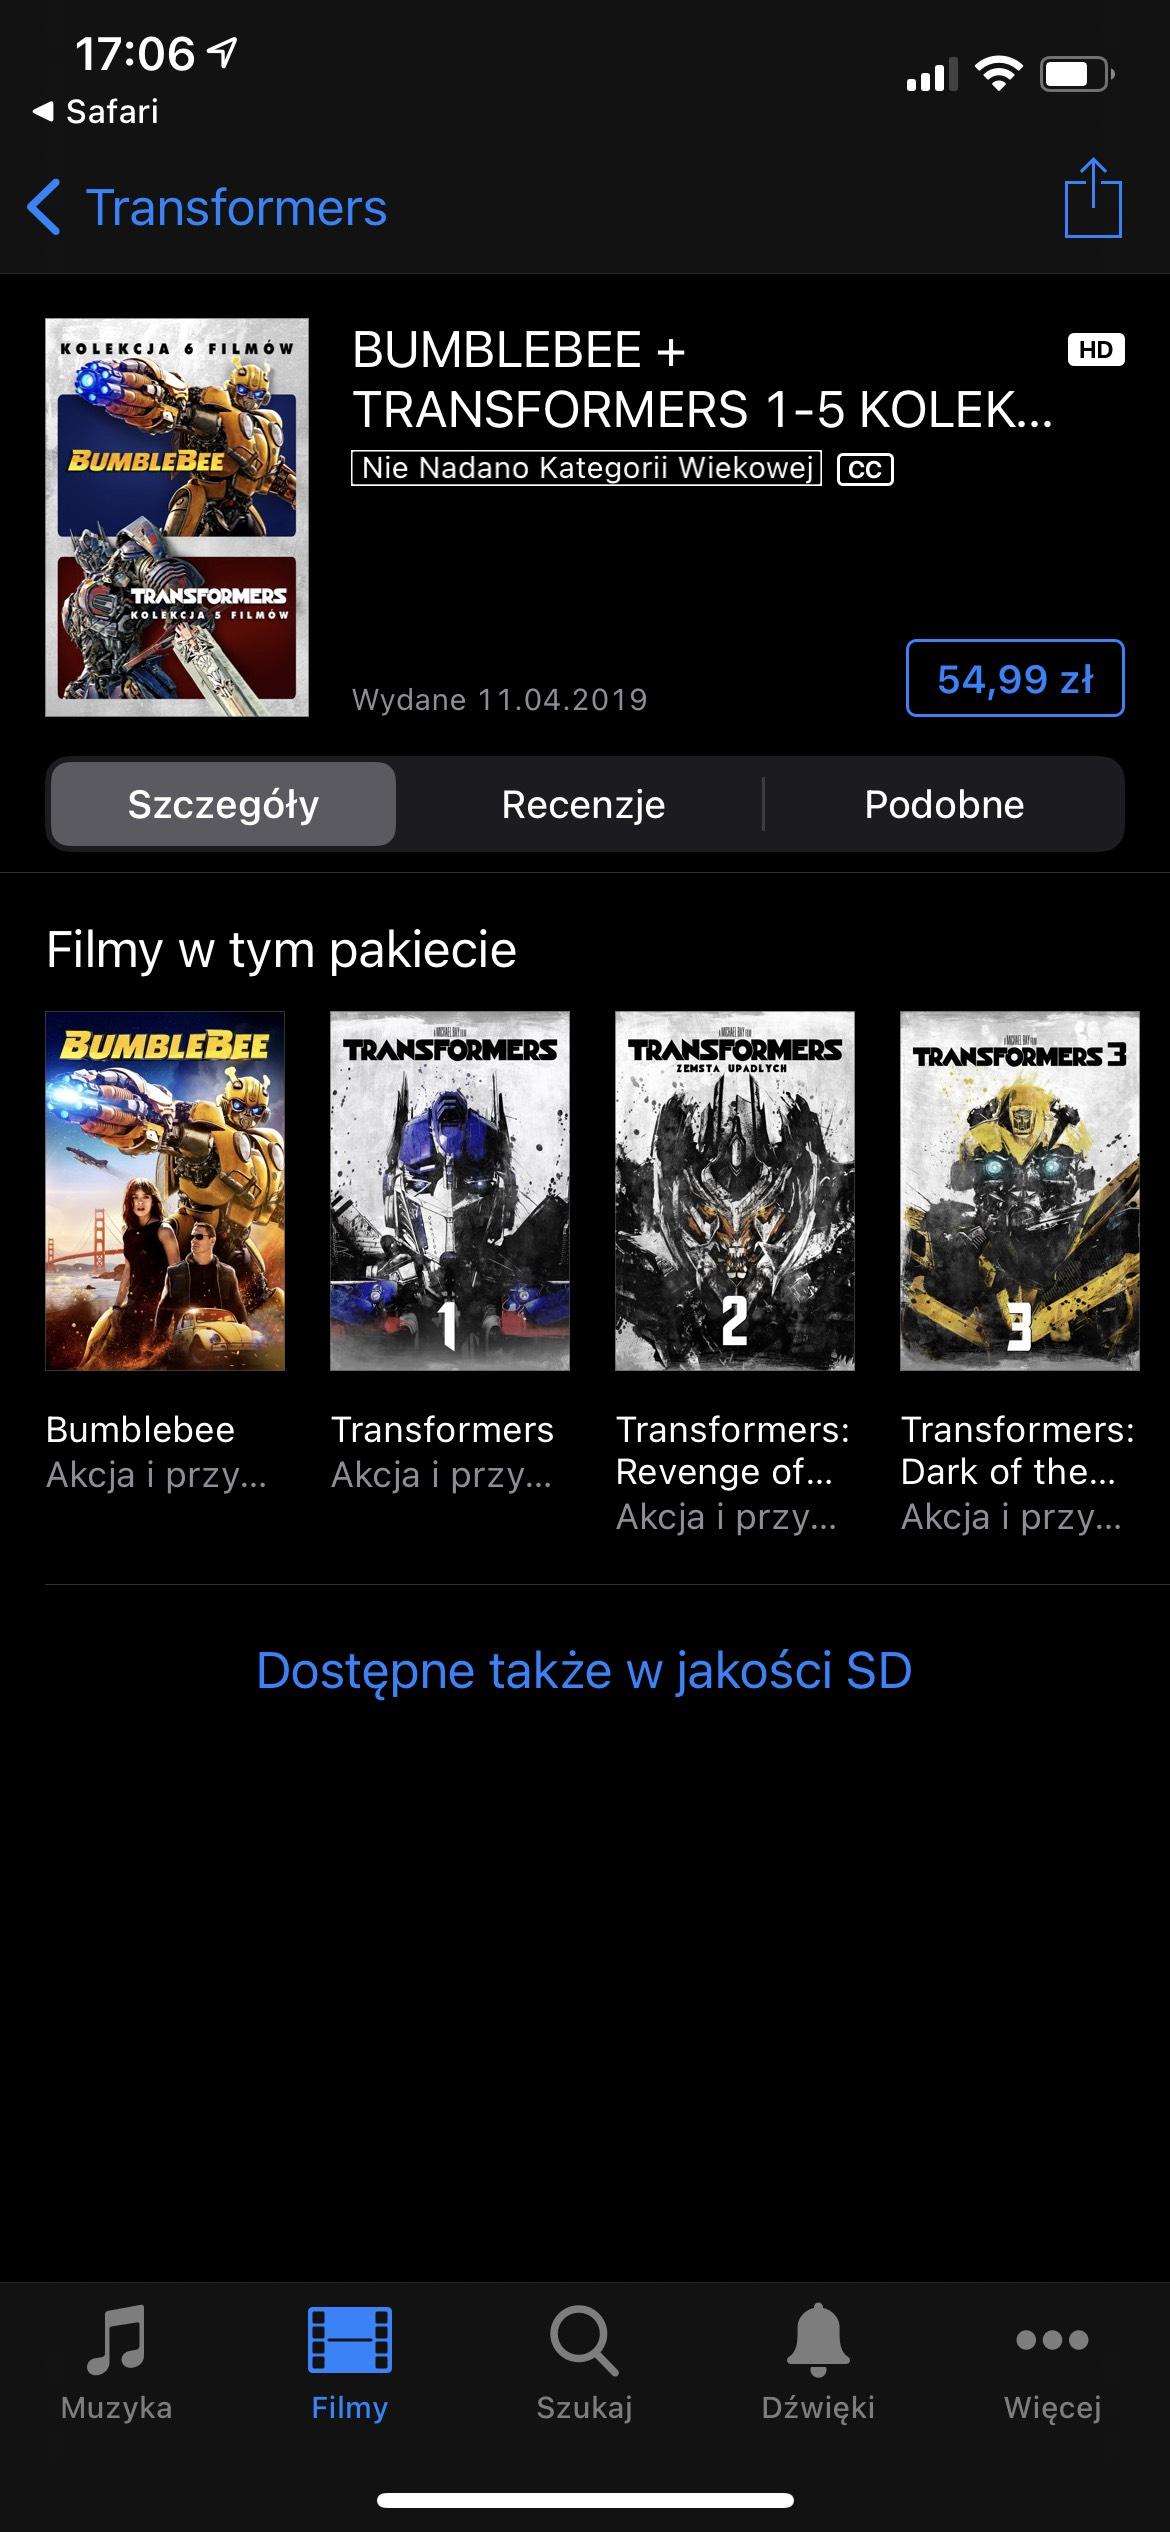 "Kolekcja filmów z serii ""Transformers"" + ""Bumblebee"". Apple iTunes Store. 4K. Dolby Vision. Dolby Atmos."